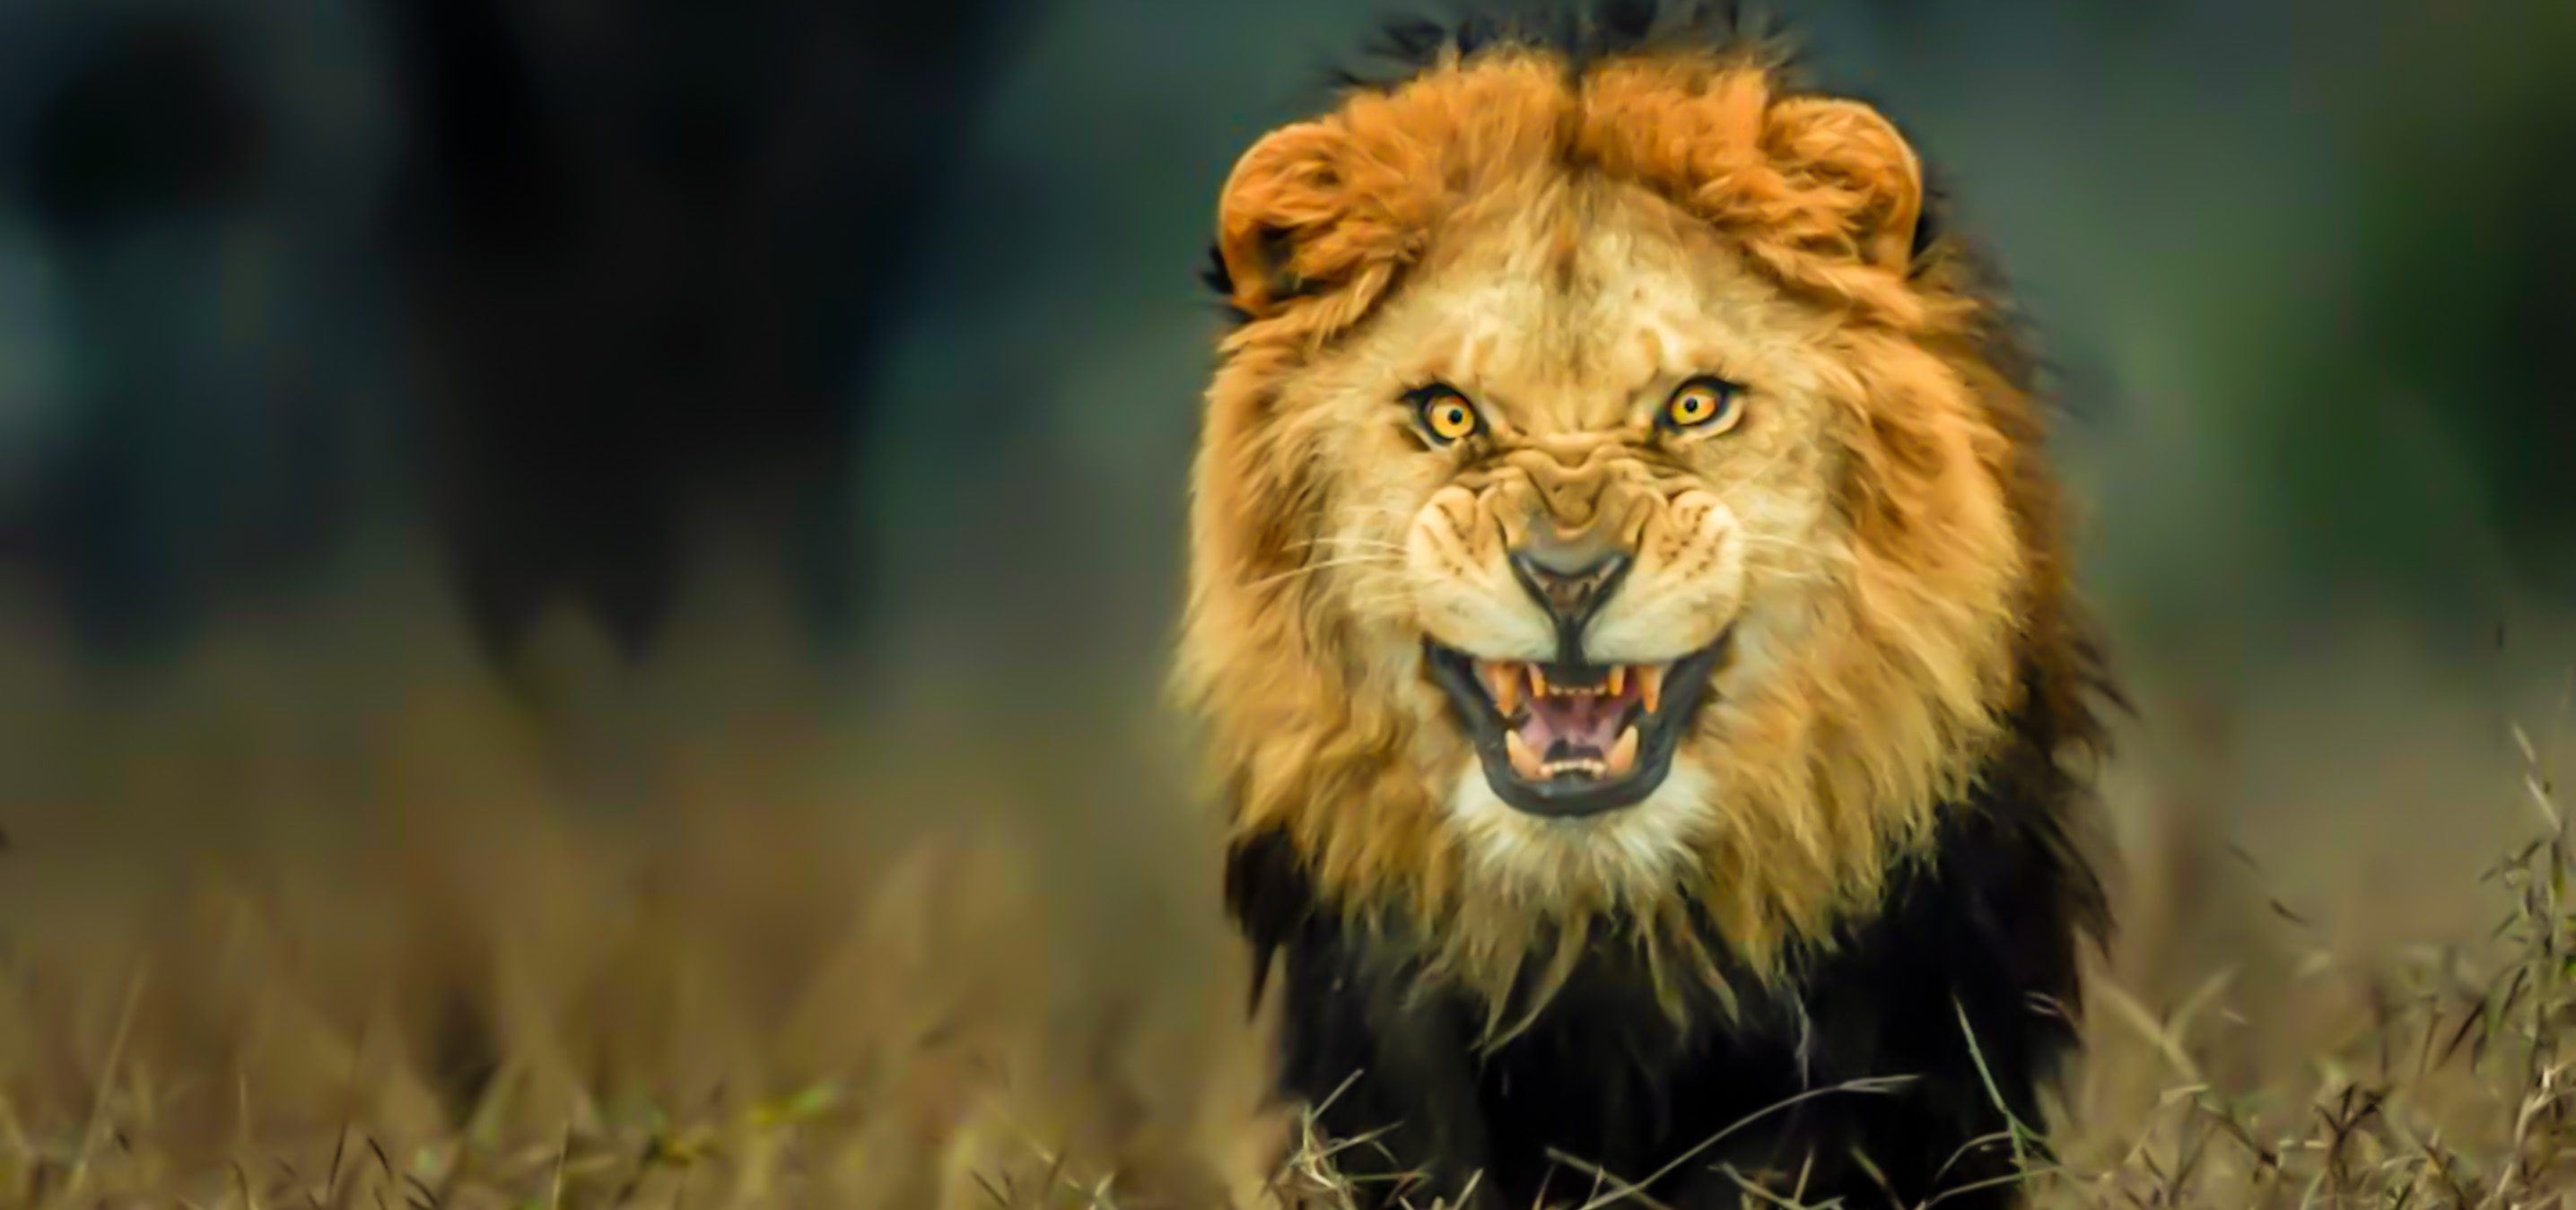 Branco di leoni sbrana bracconieri